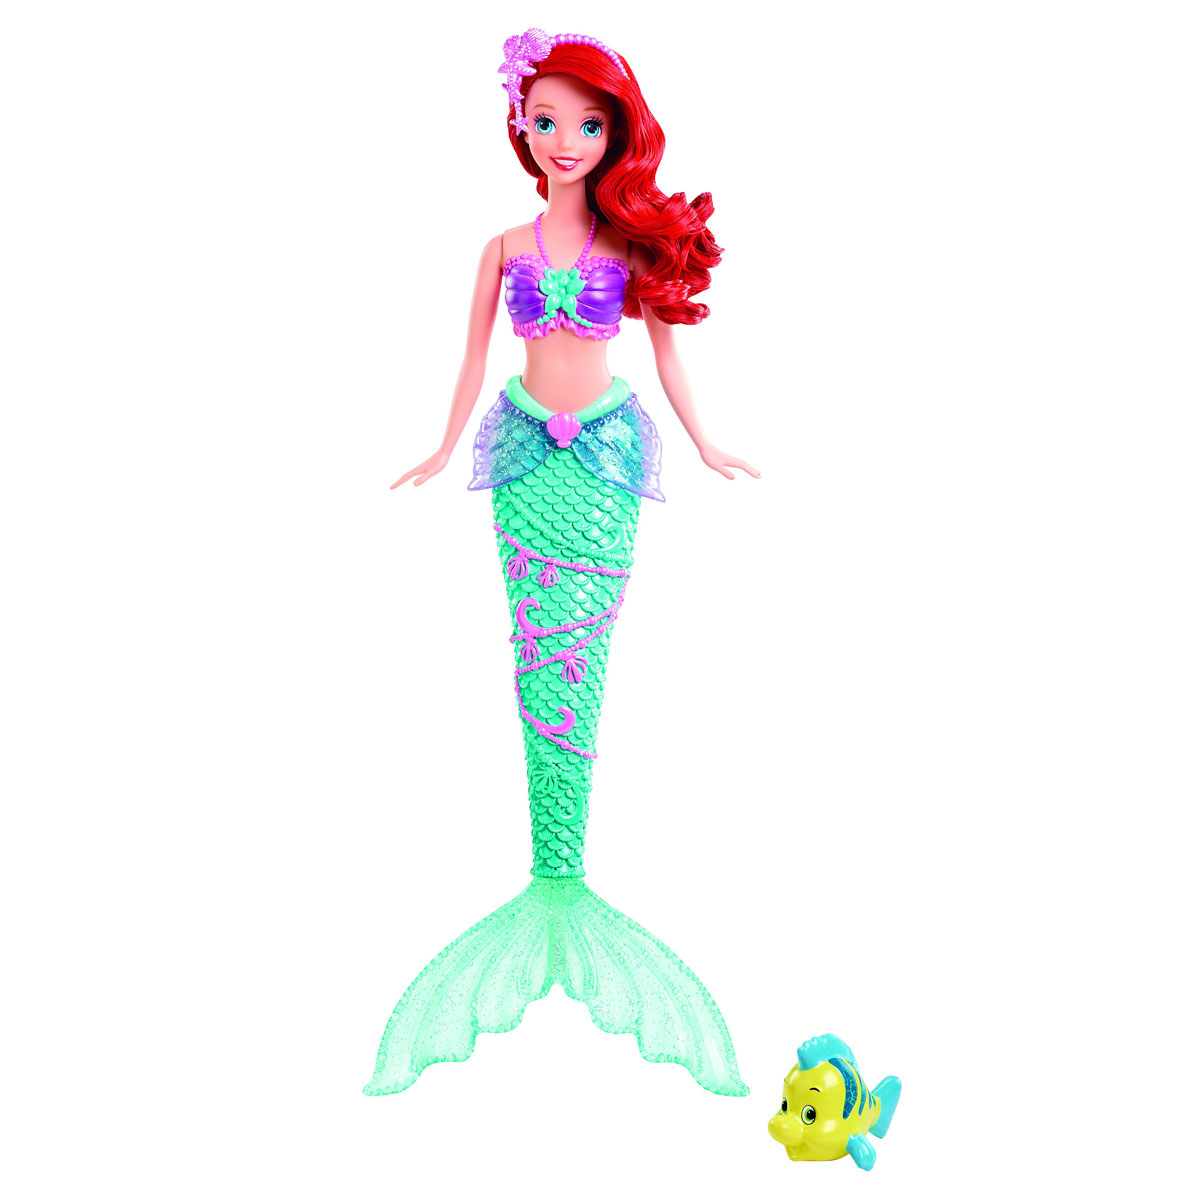 Disney Princess Кукла Русалочка Ариель c фонтанчиком и рыбка Флаундер disney кукла ариэль disney princess